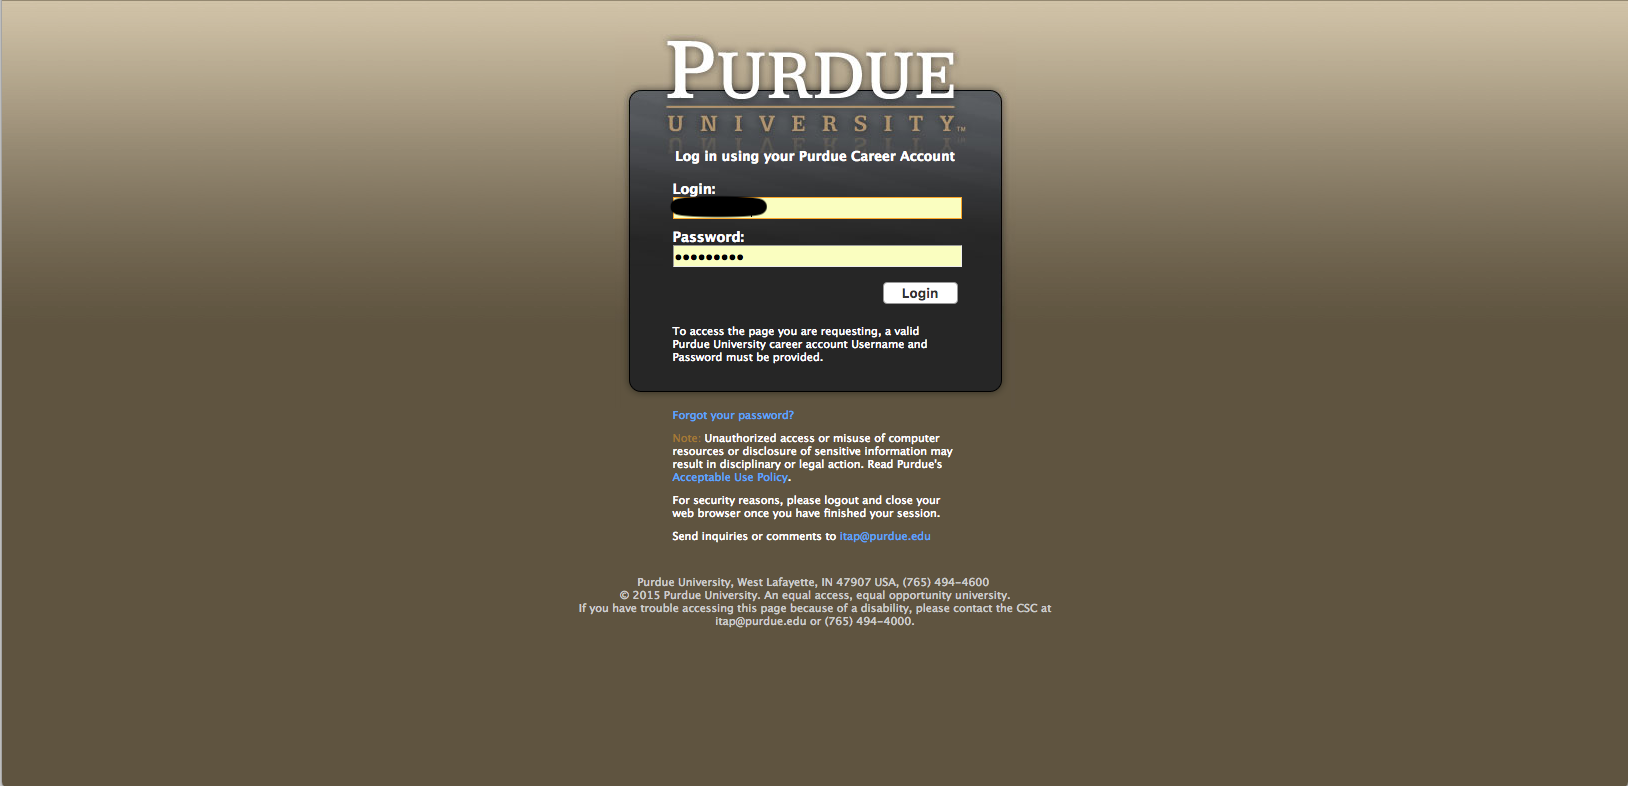 Adobe Dashboard - Engineering Computer Network - Purdue